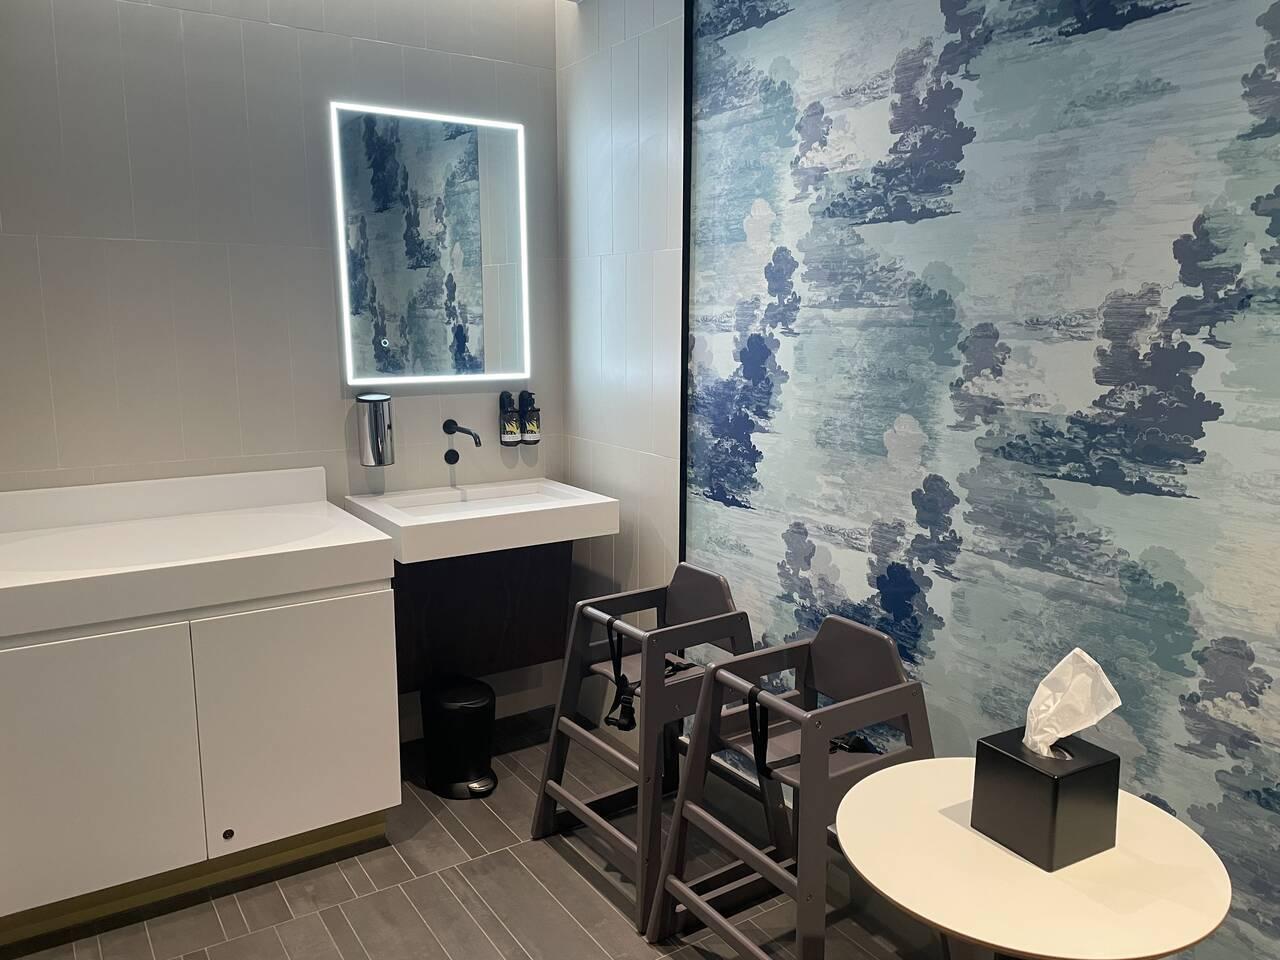 American Express Centurion Lounge London Heathrow Airport